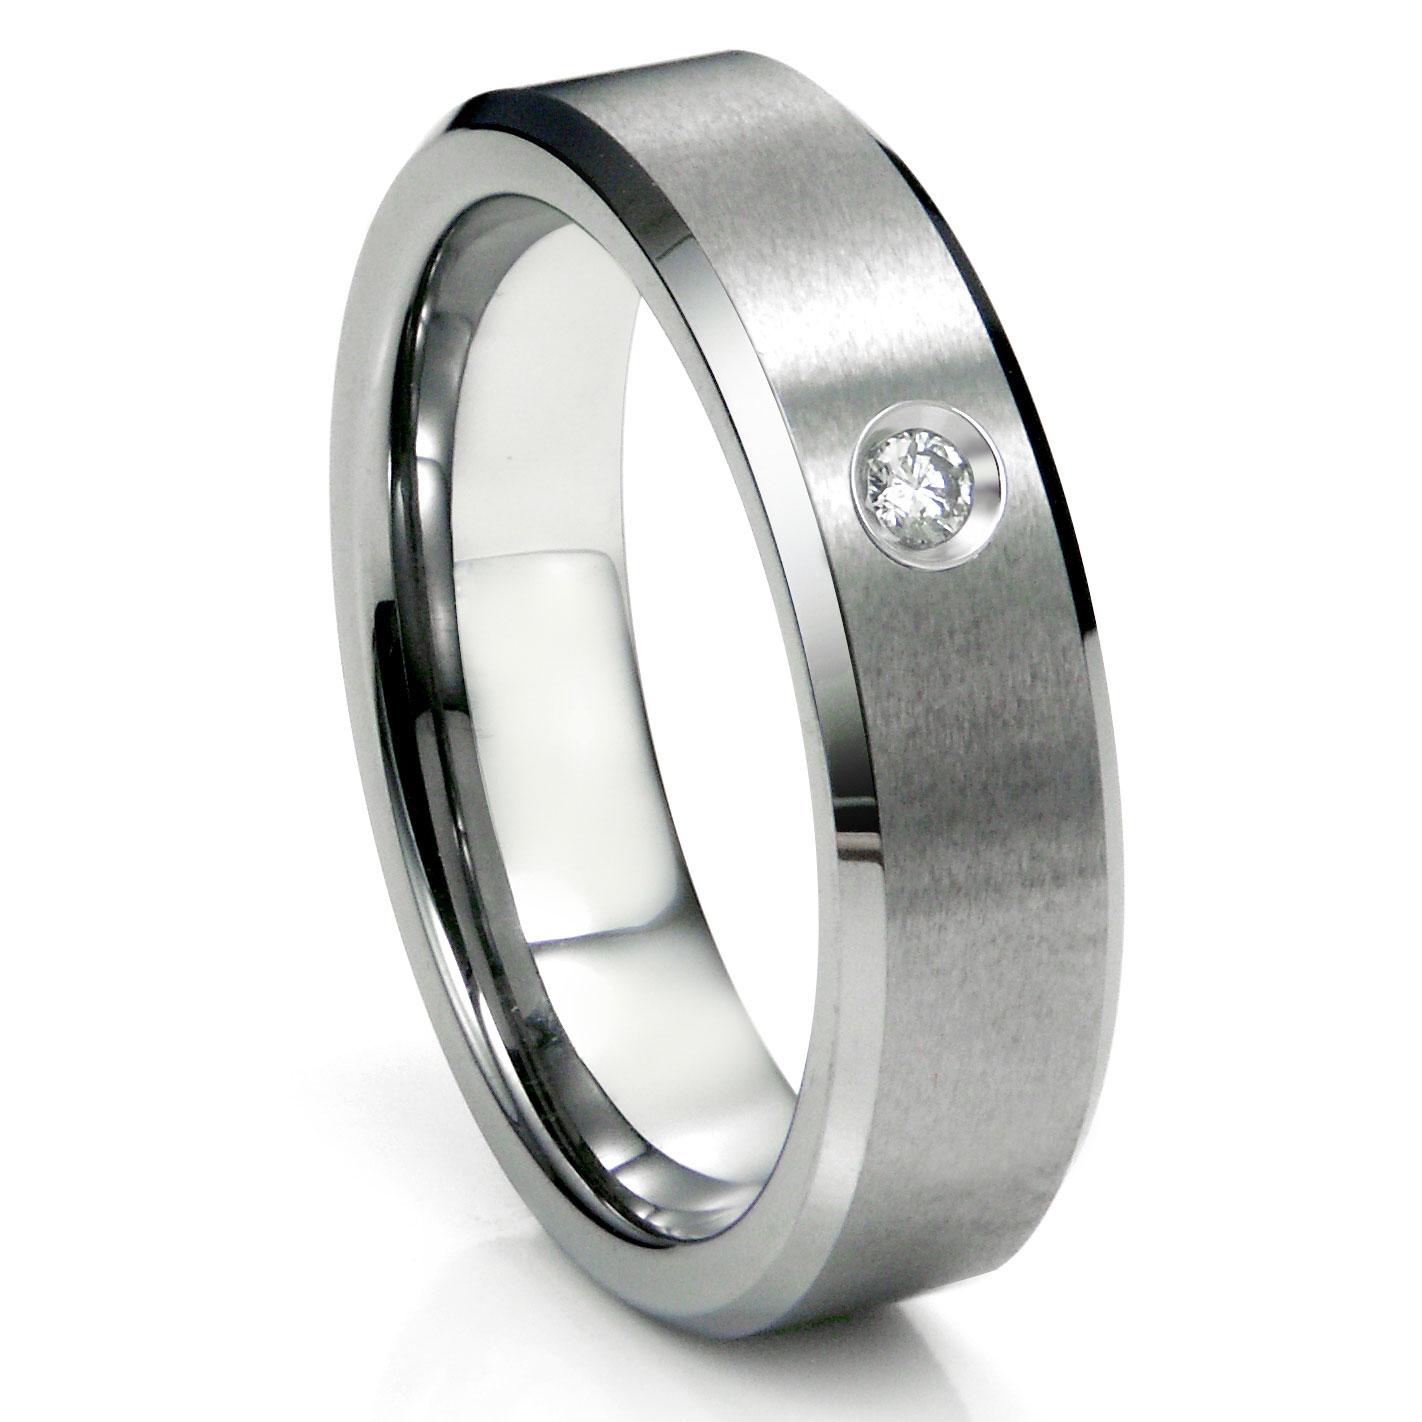 tungsten carbide diamond satin finish beveled men's wedding ring